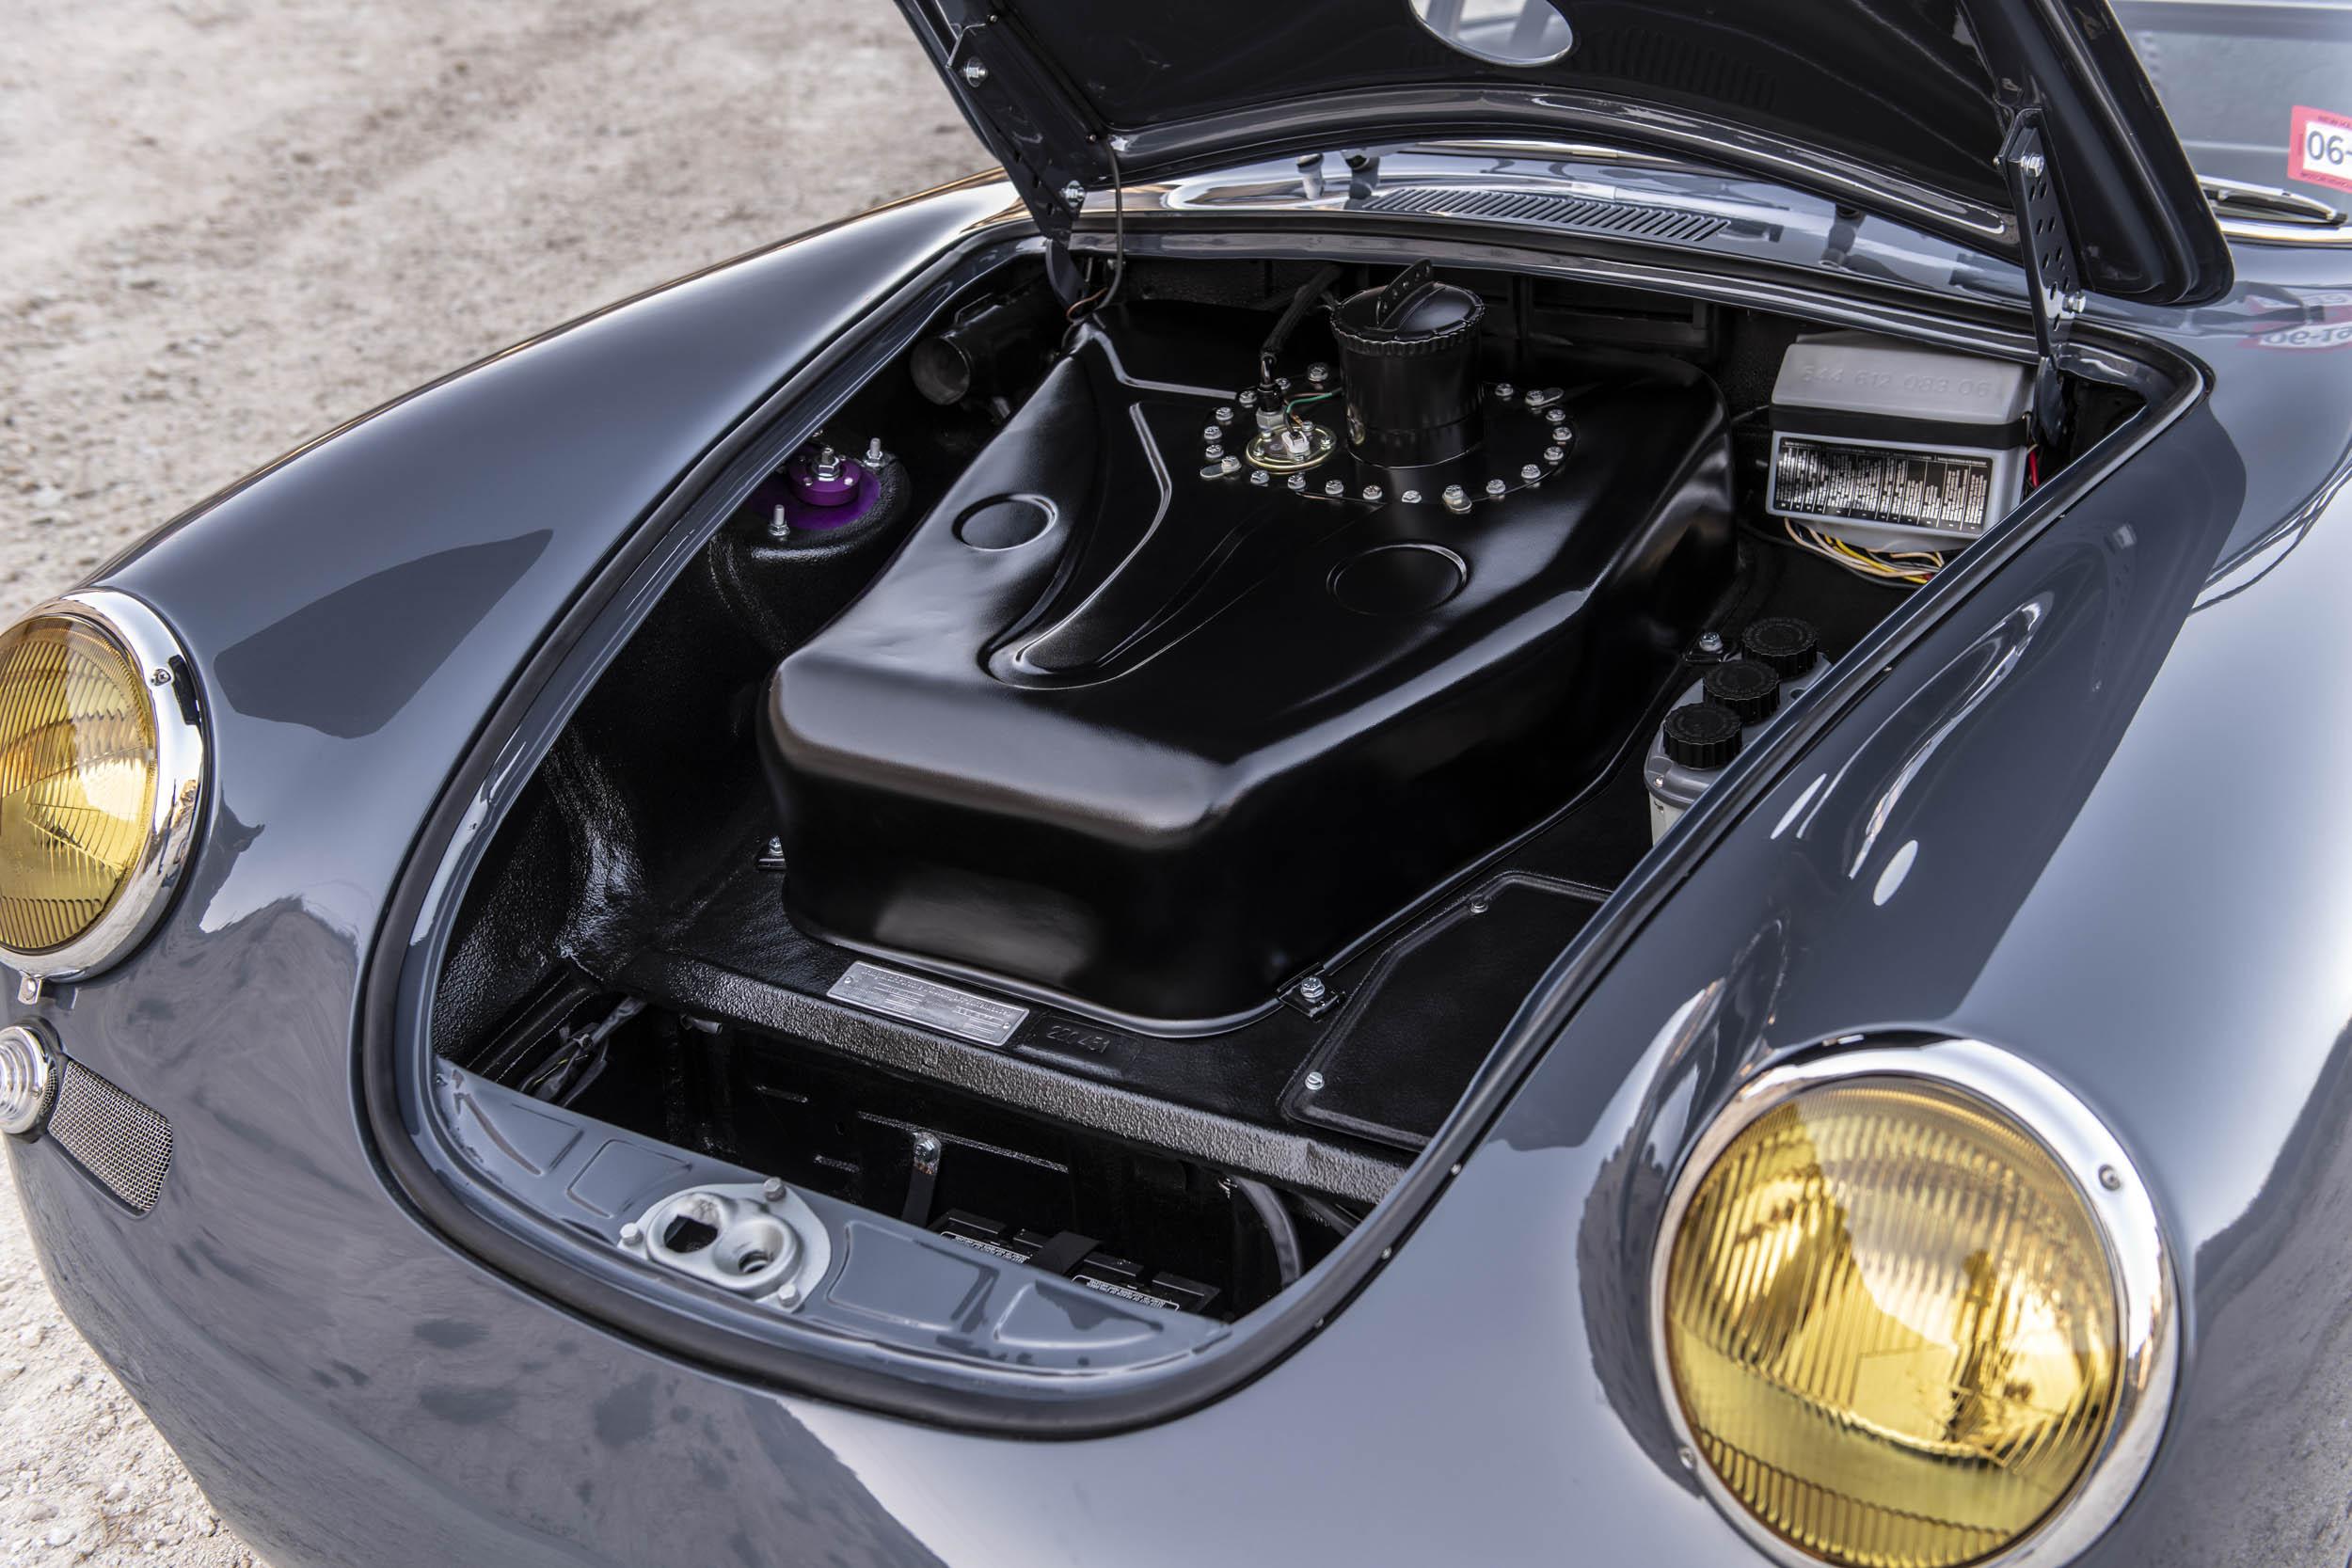 Emory Porsche 356 C4S Allrad frunk